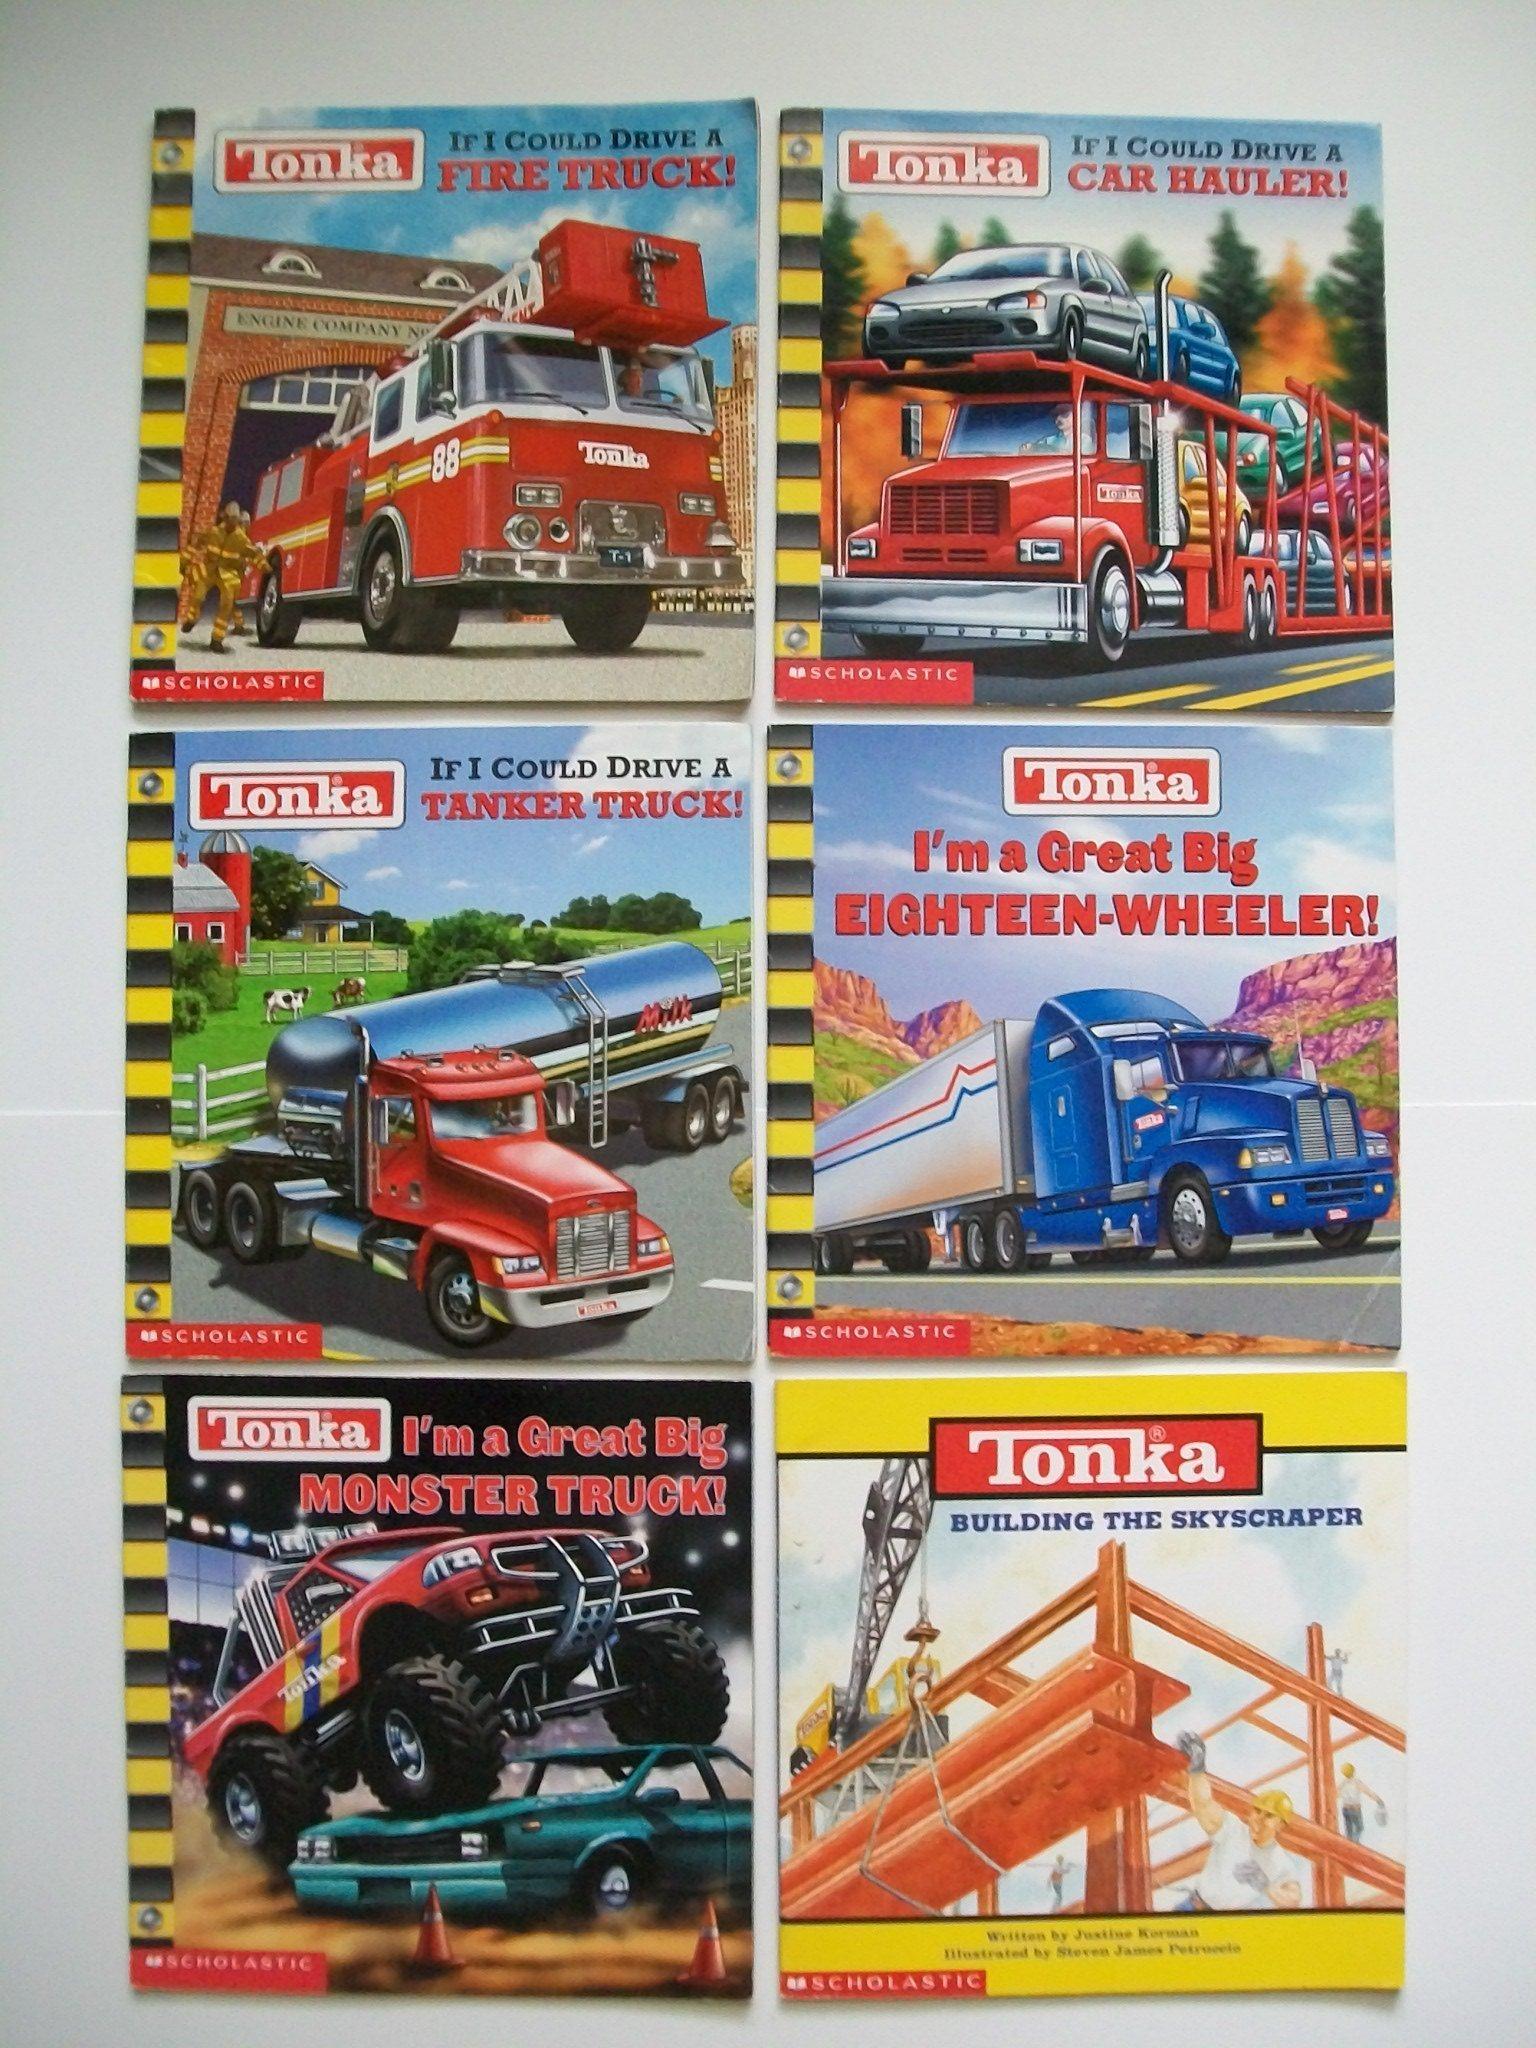 Tonka Trucks (Set of 6) Fire Truck; Car Hauler; Tanker Truck; 18-Wheeler;  Monster Truck: Michael Teitelbaum, Michael Anthony Steele: Amazon.com: Books